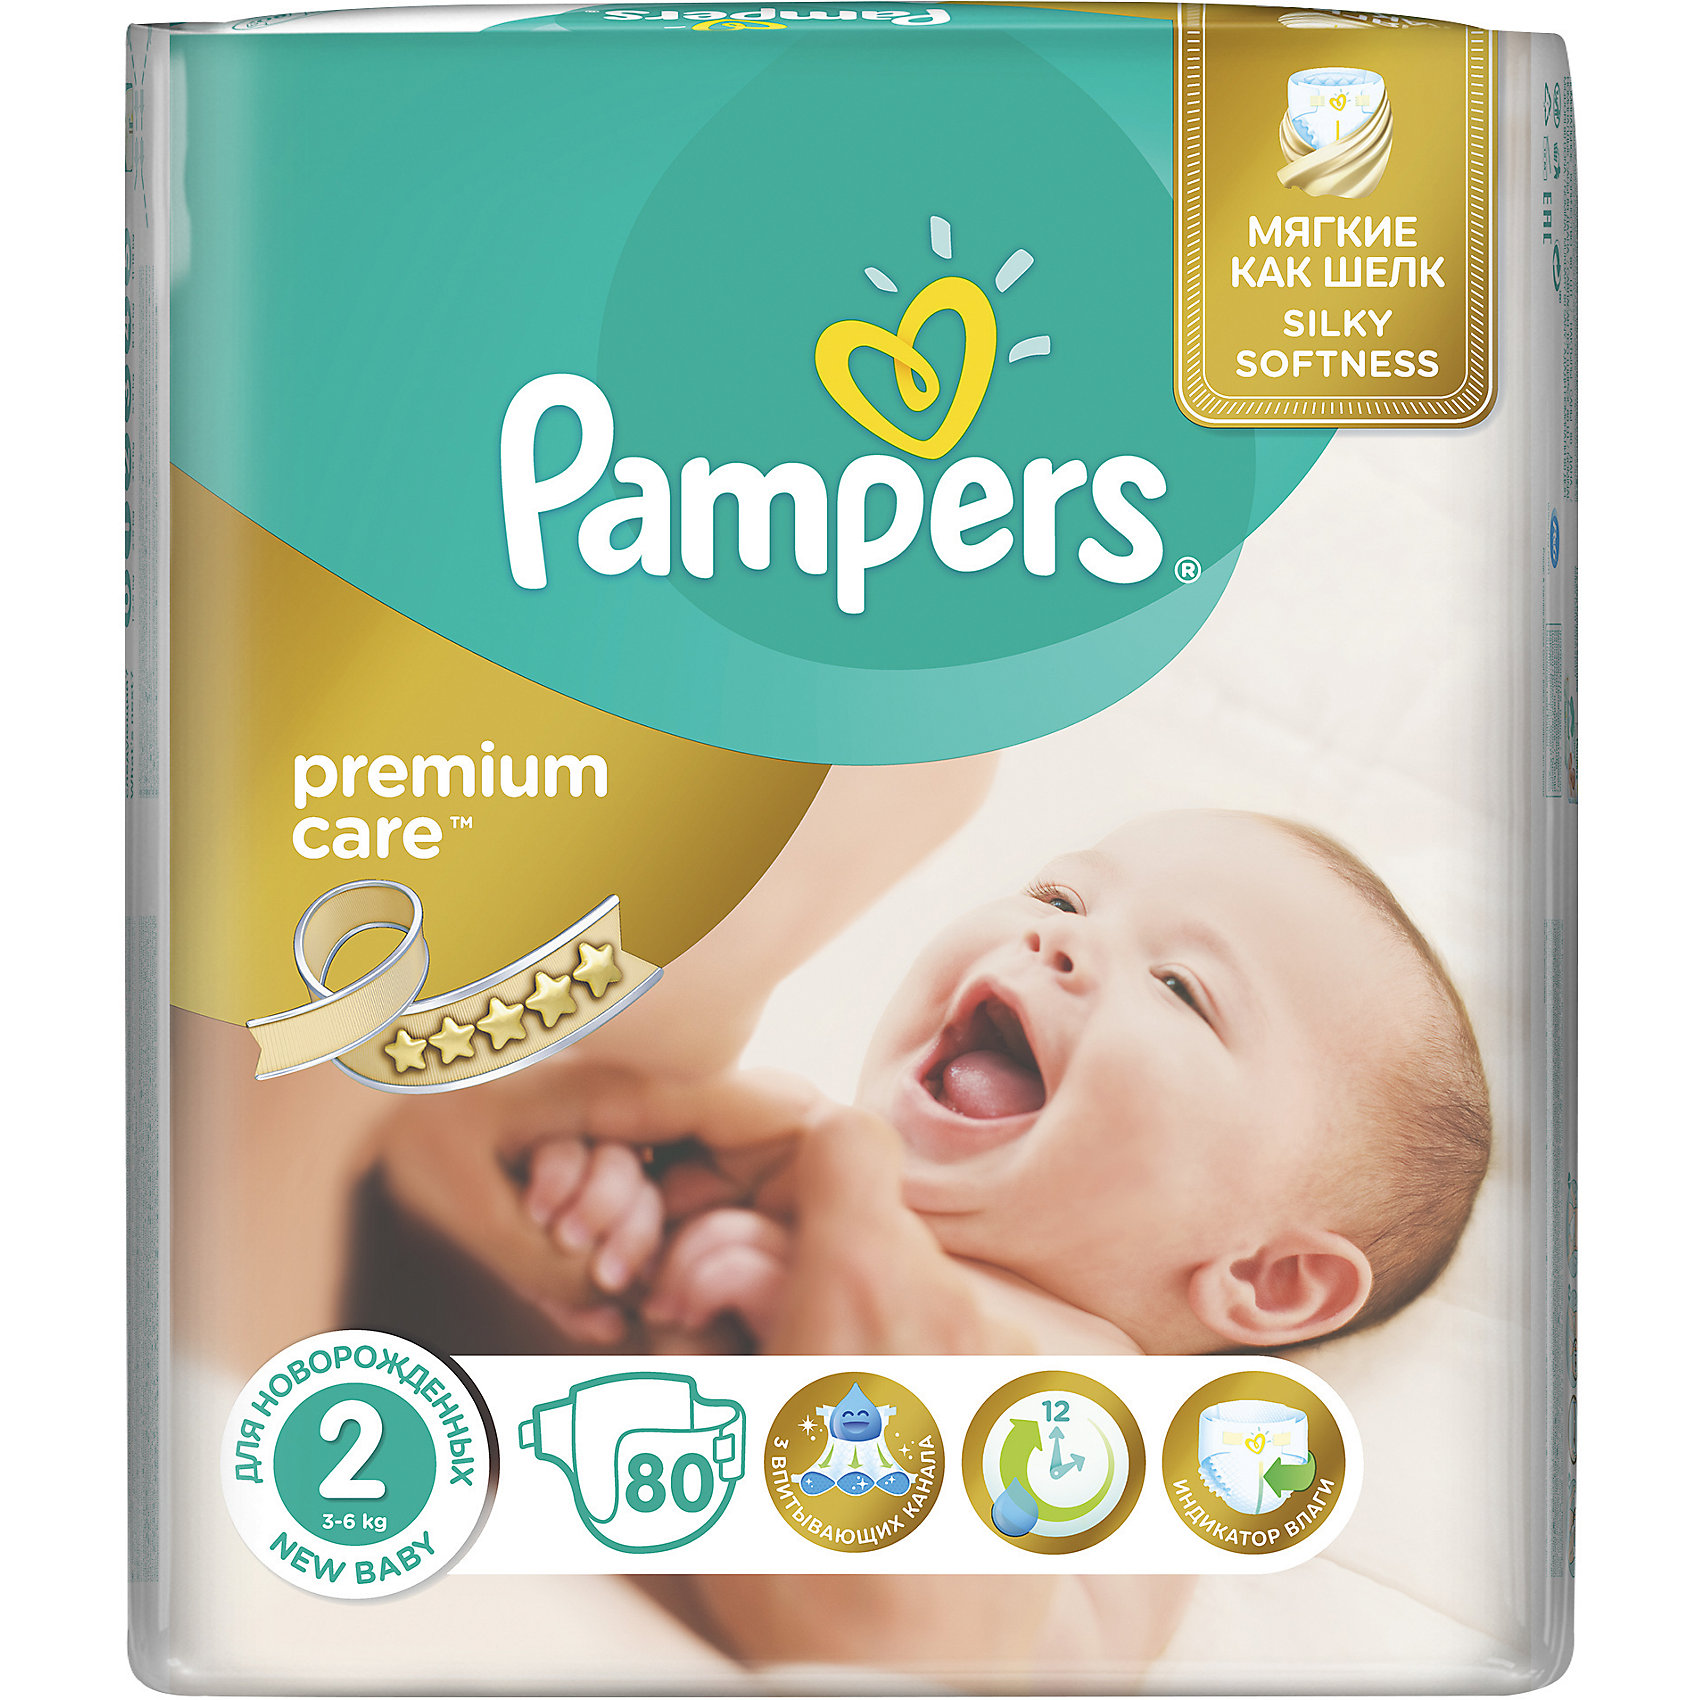 Подгузники Pampers Premium Care MIni, 3-6 кг, 2 размер, Economy pack, 80 шт., Pampers<br><br>Ширина мм: 316<br>Глубина мм: 110<br>Высота мм: 376<br>Вес г: 1762<br>Возраст от месяцев: 1<br>Возраст до месяцев: 3<br>Пол: Унисекс<br>Возраст: Детский<br>SKU: 5516311